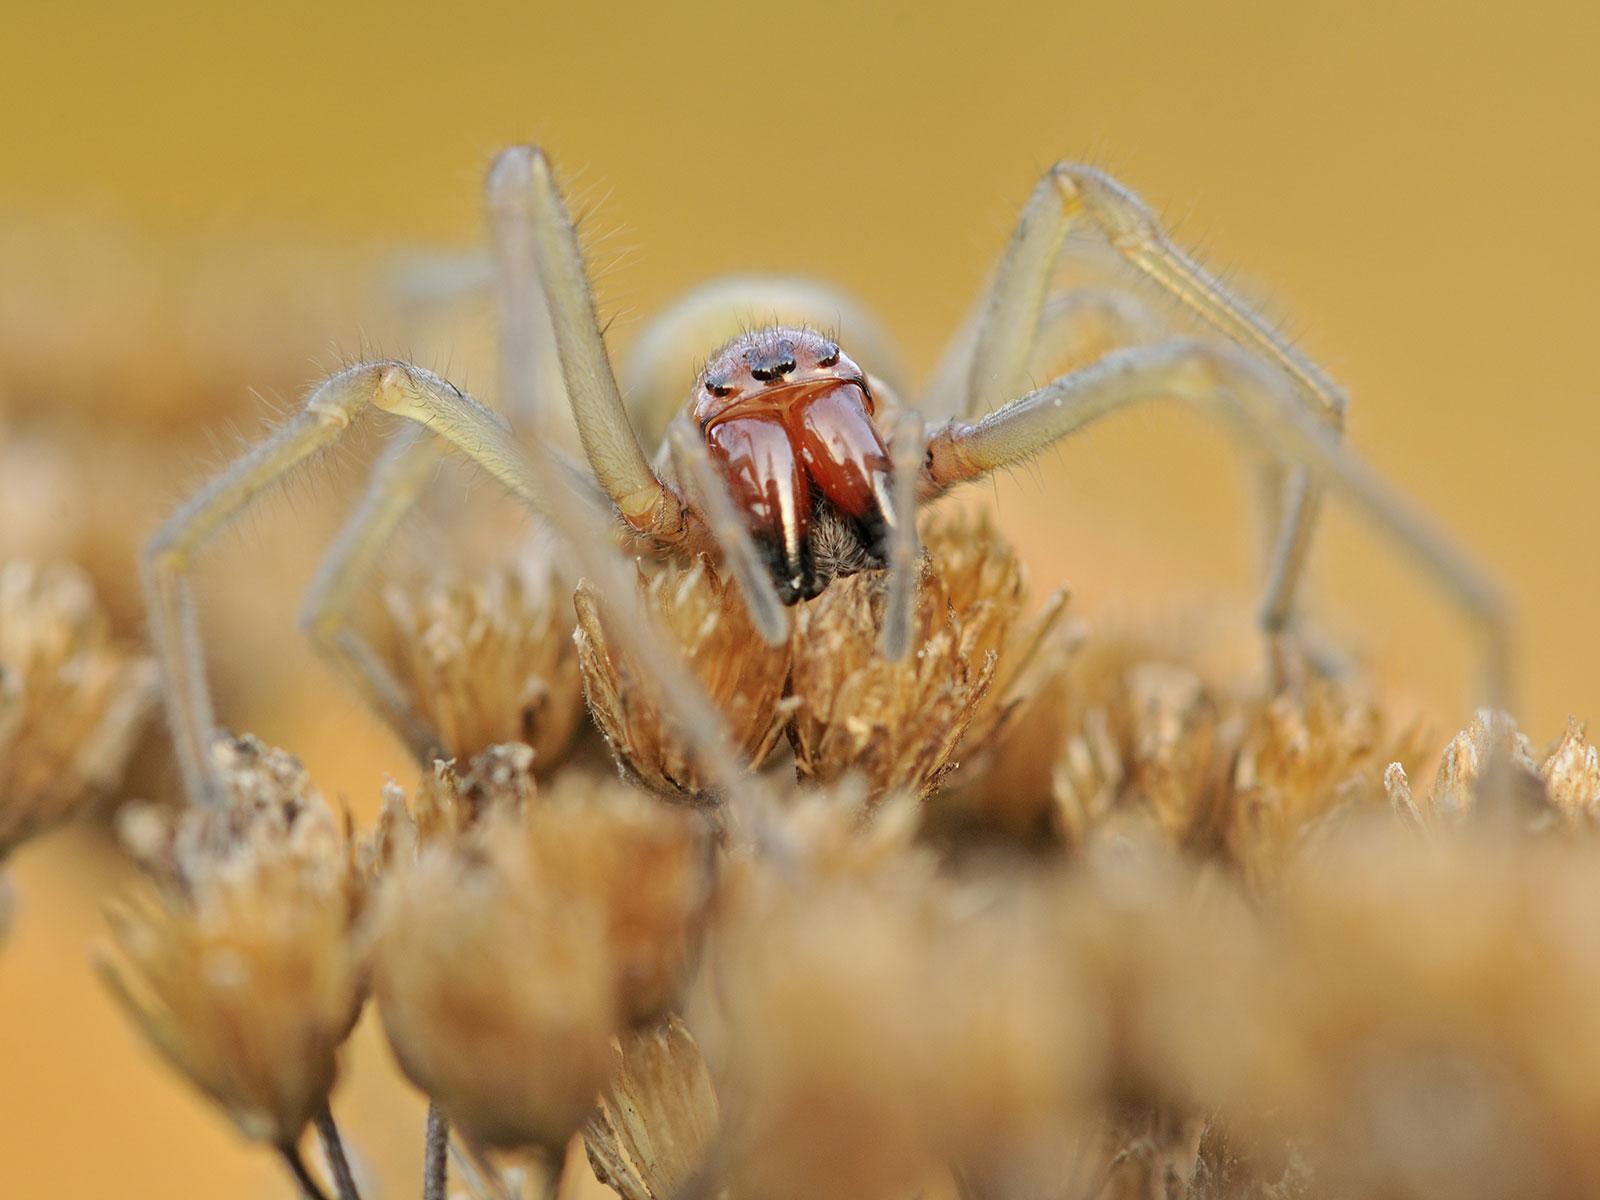 edderkopp bid med smertefuld erektion